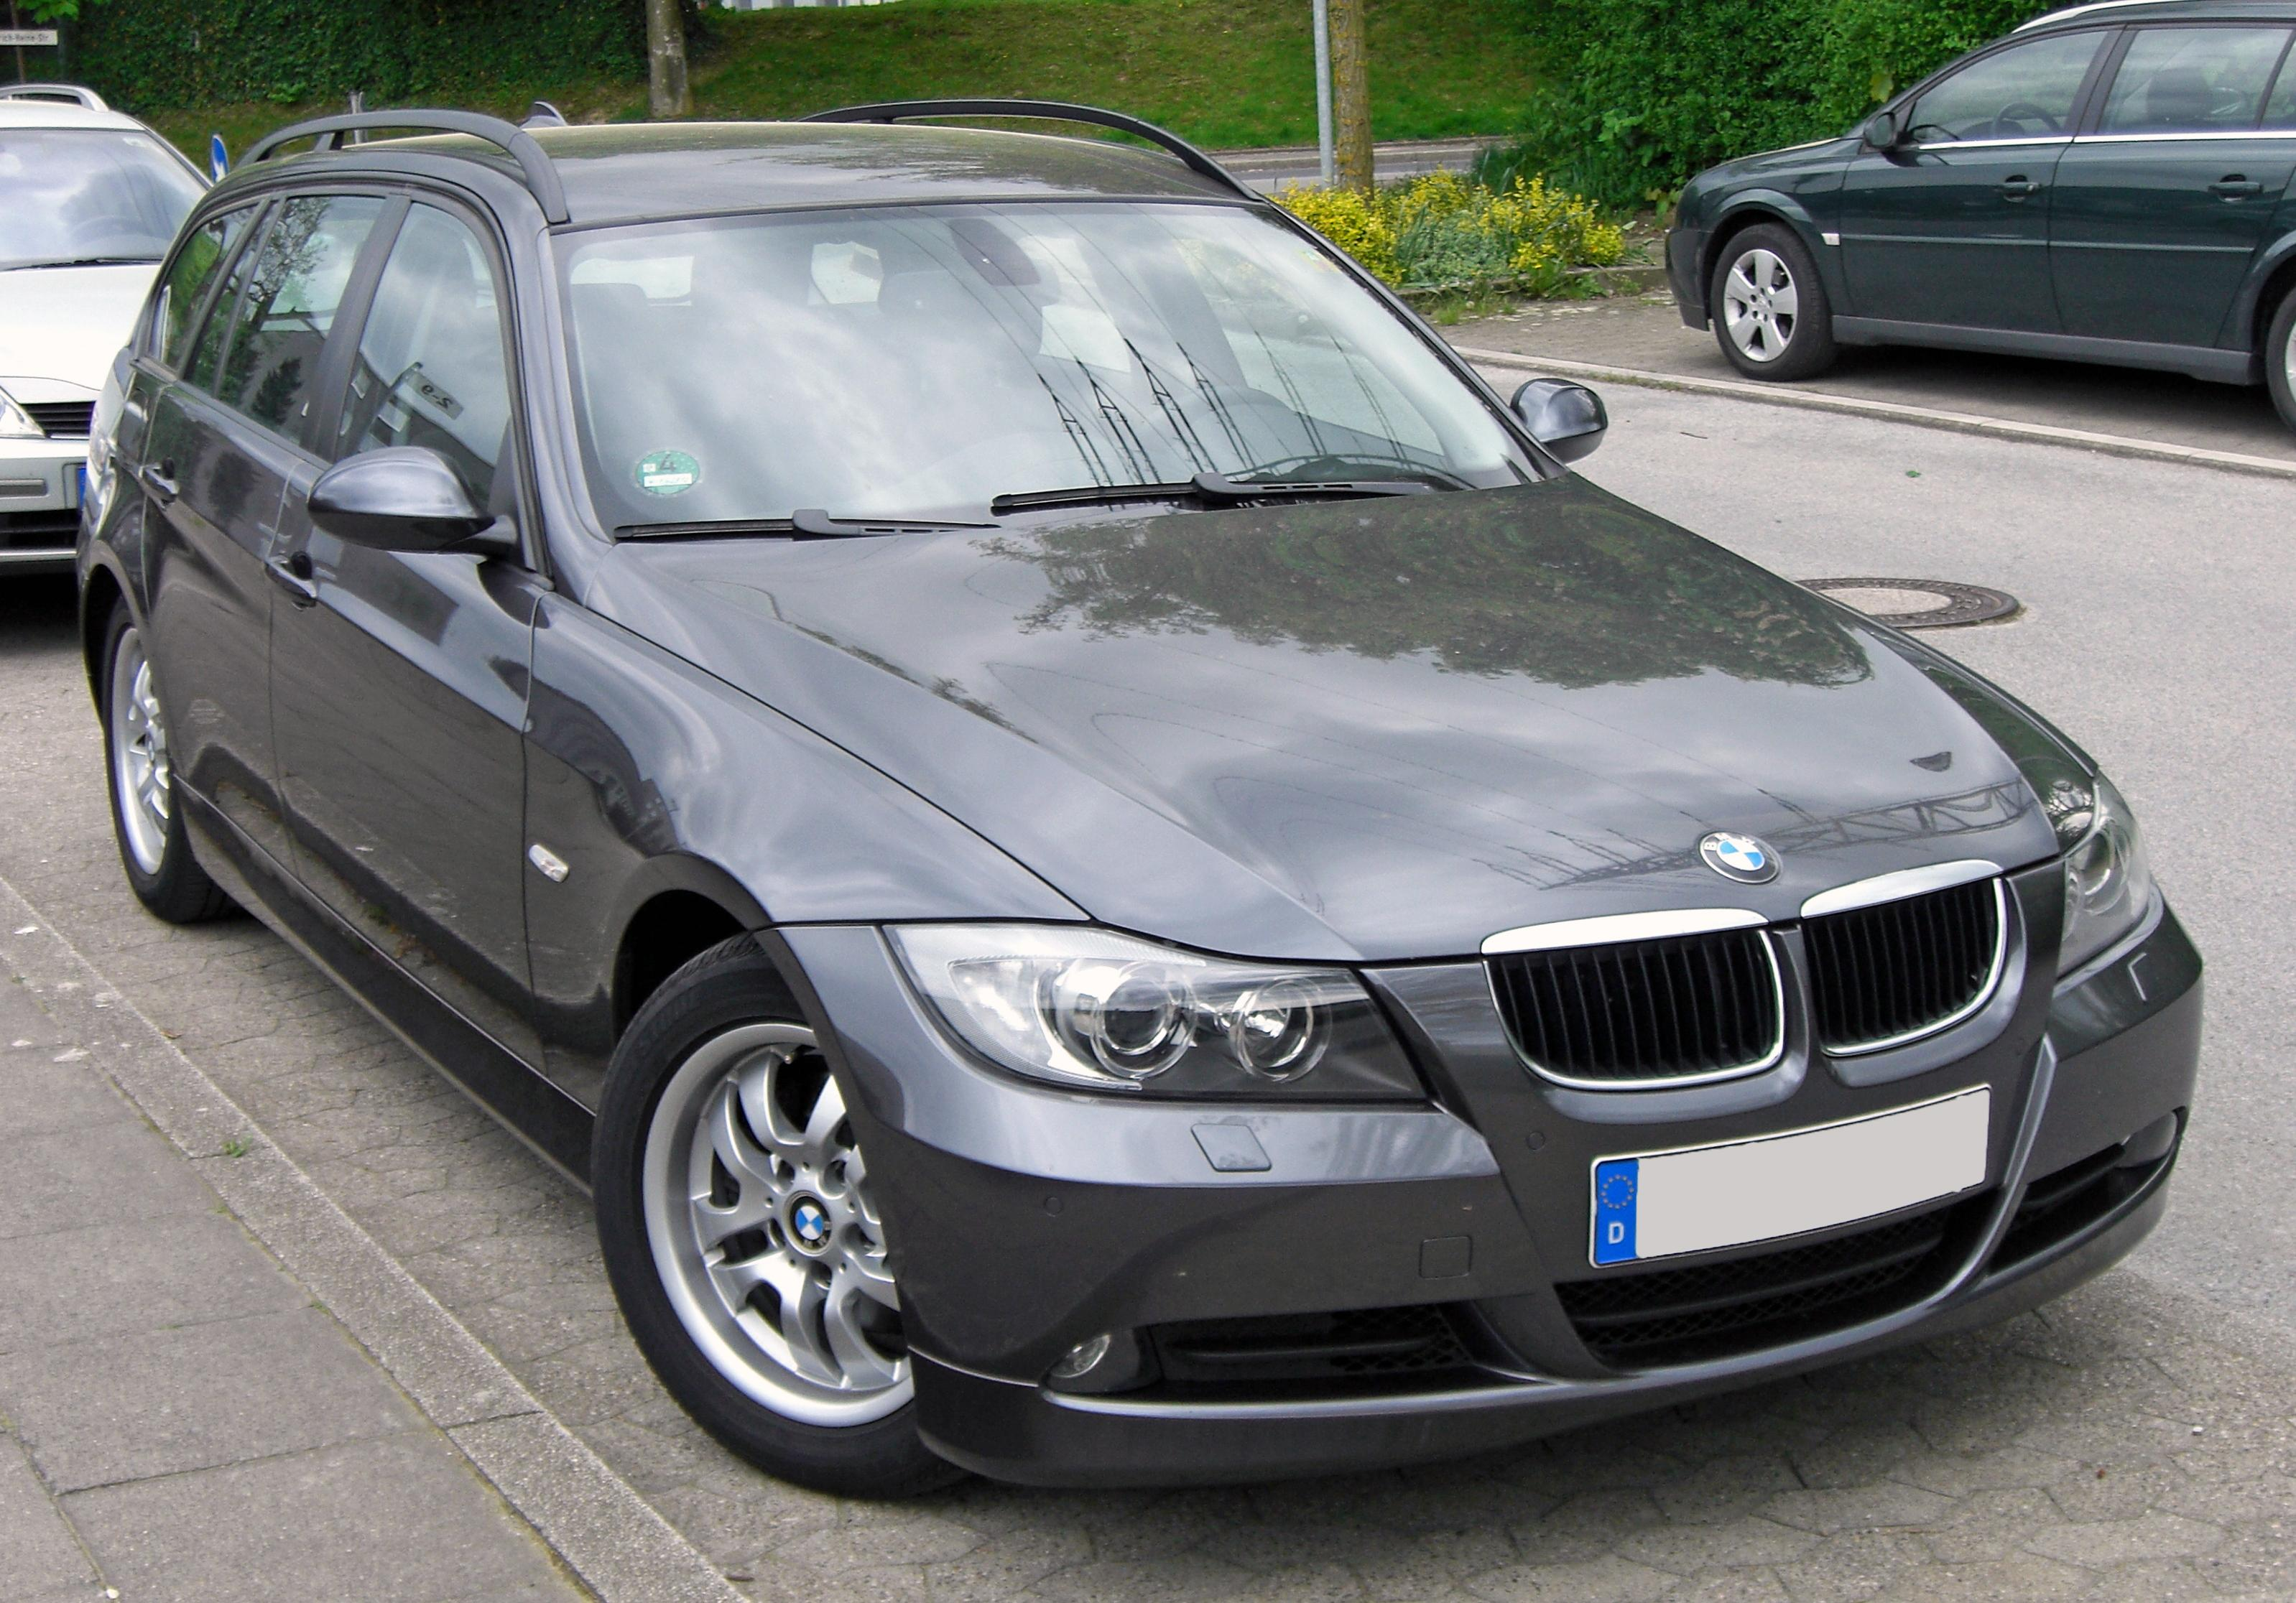 Bmw E90 Wiki >> File:BMW 3er Touring E91 20090425 front.JPG - Wikimedia ...